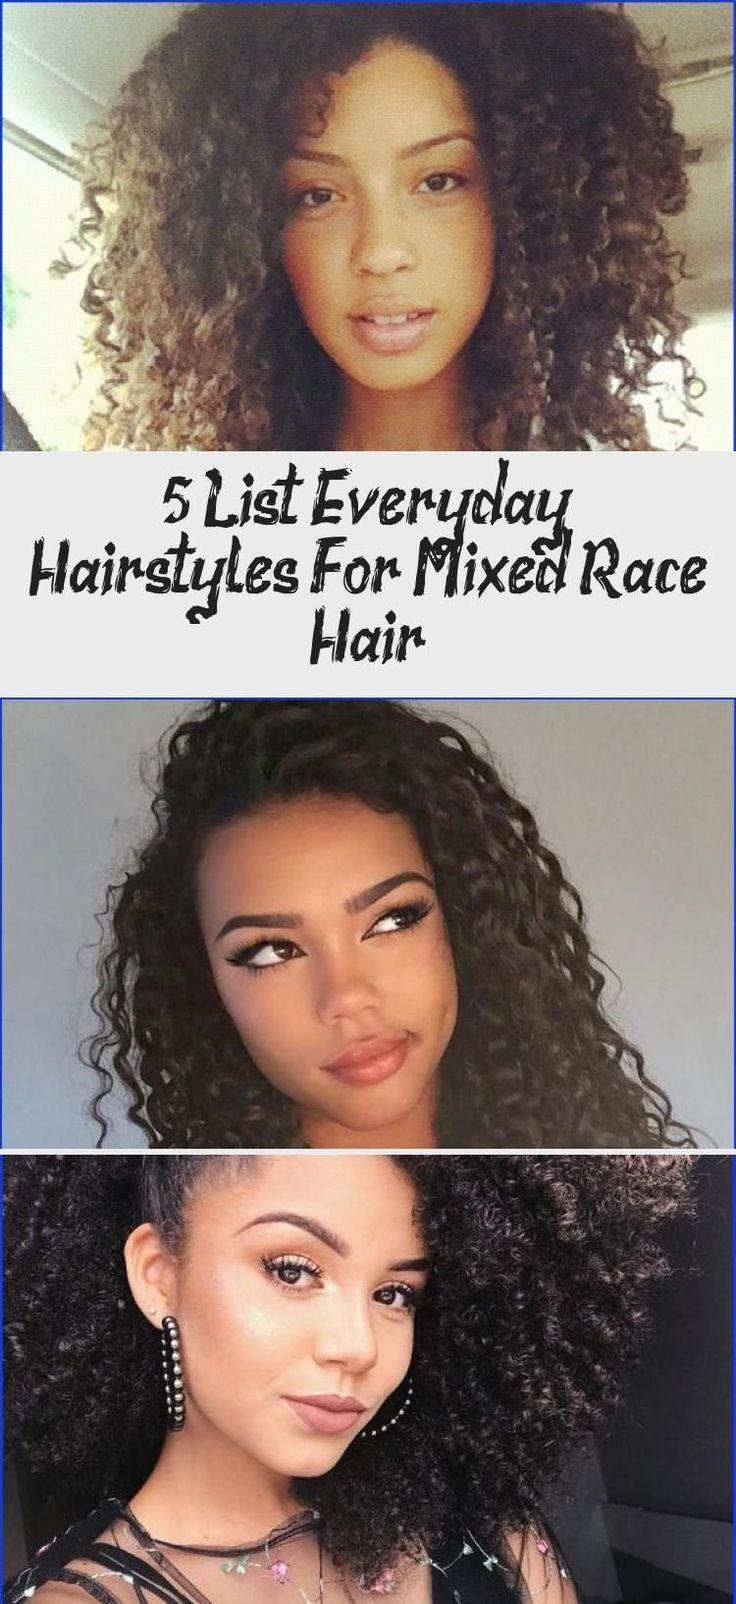 5 List Everyday Hairstyles For Mixed Race Hair   Hair ...